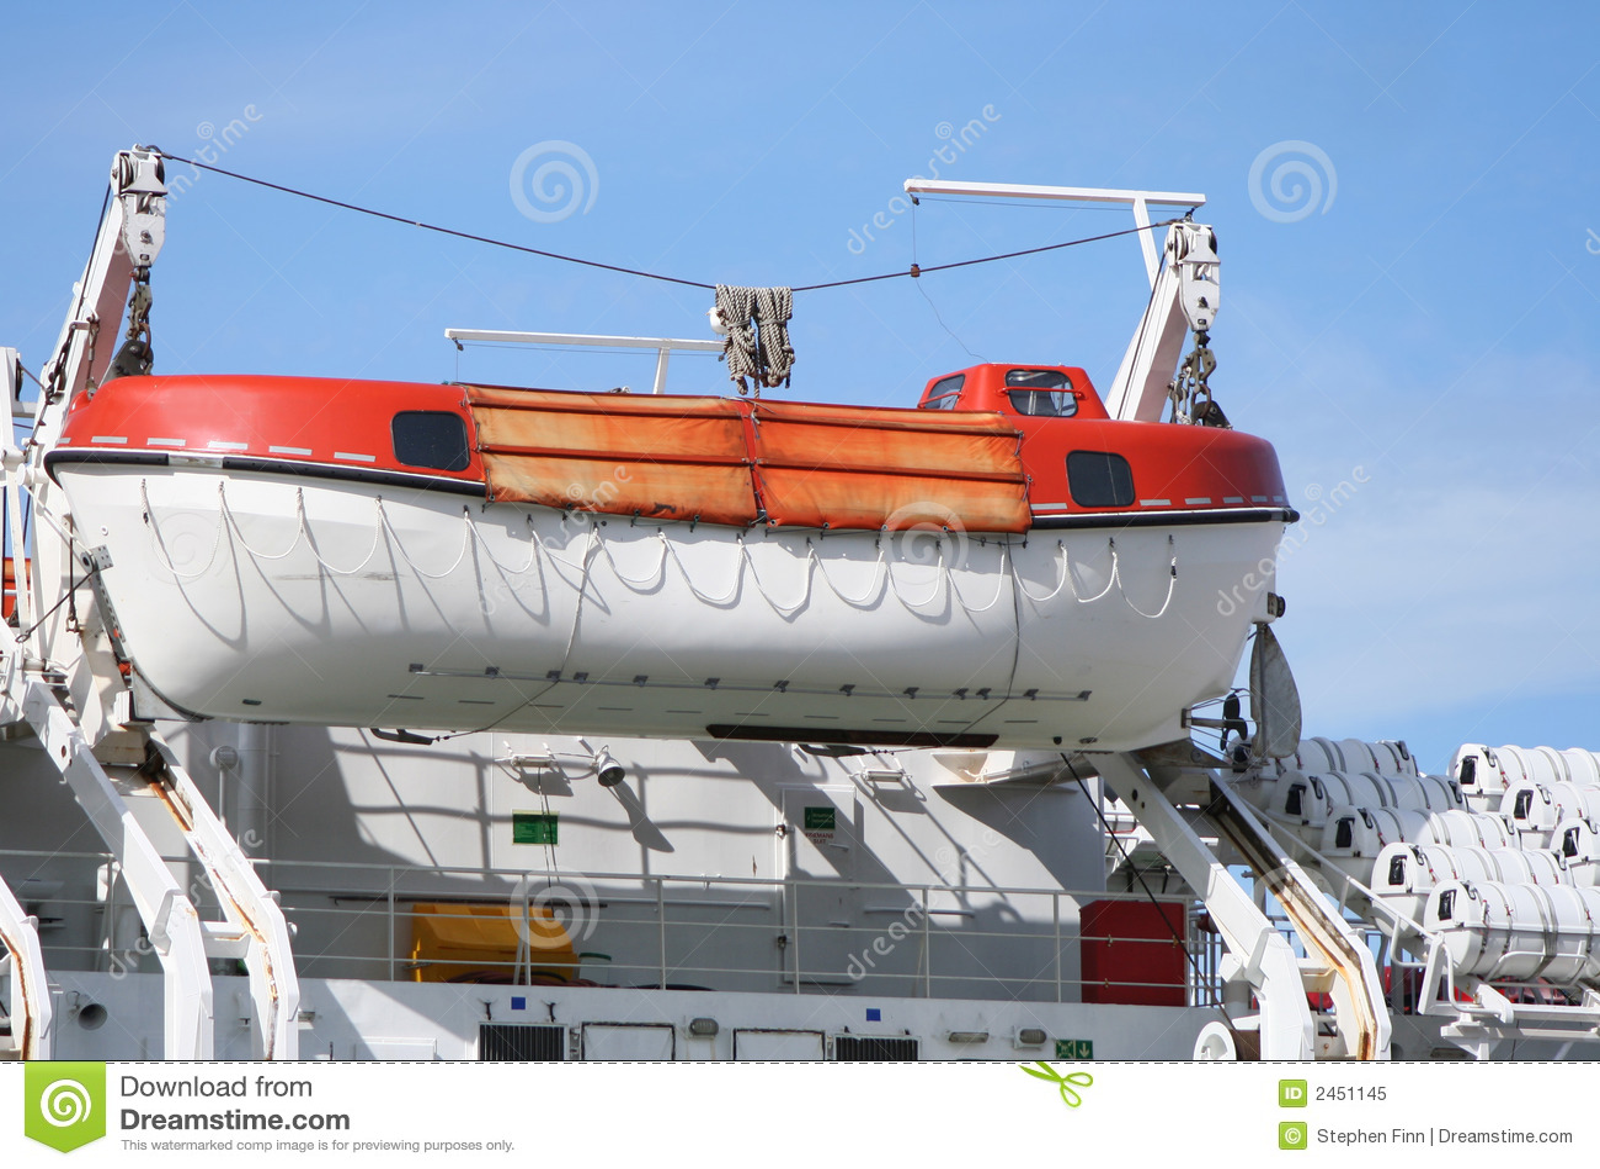 Pixstel - Cruise Ship Lifeboat: Image no. 22654 from Pixstel